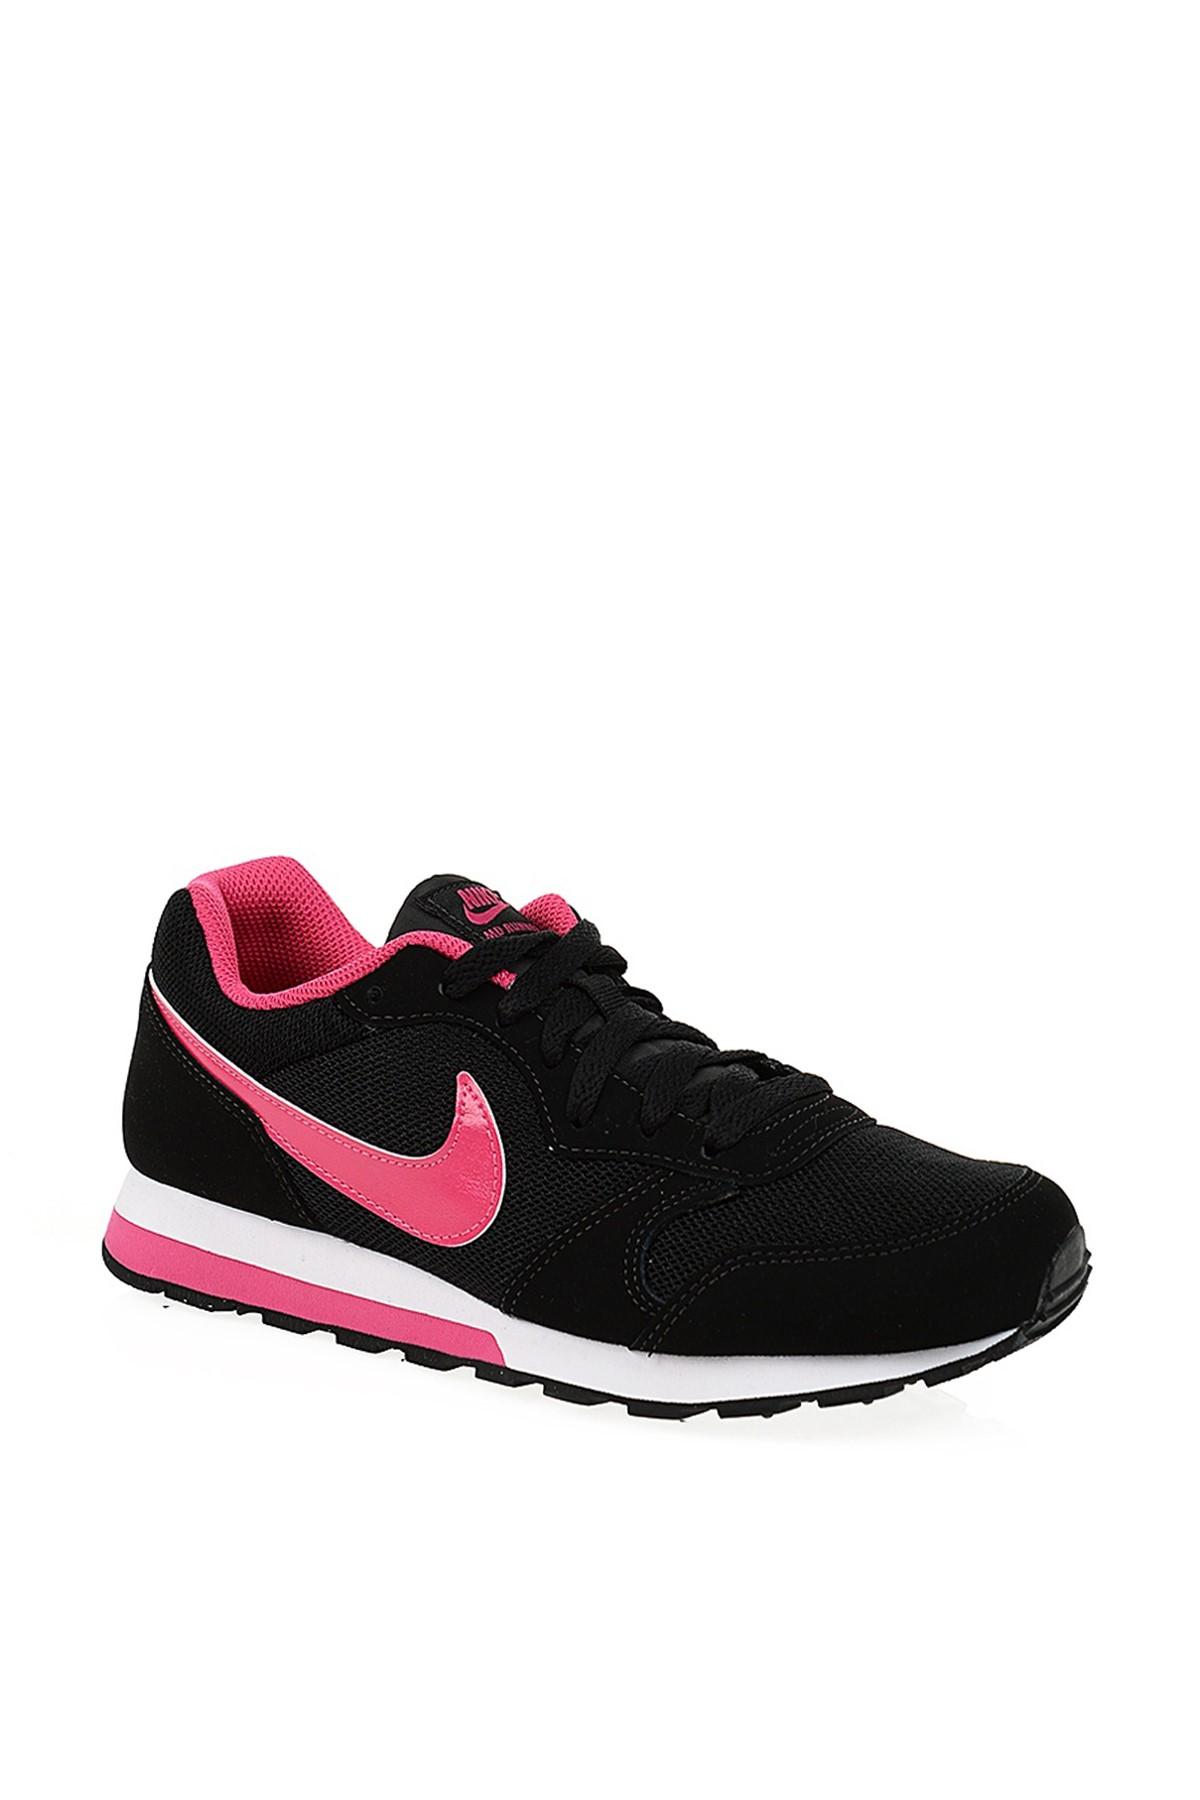 Nike Kids Siyah Pembe Kız Ayakkabı Md Runner 2 (Gs) YA - 807319-005 1